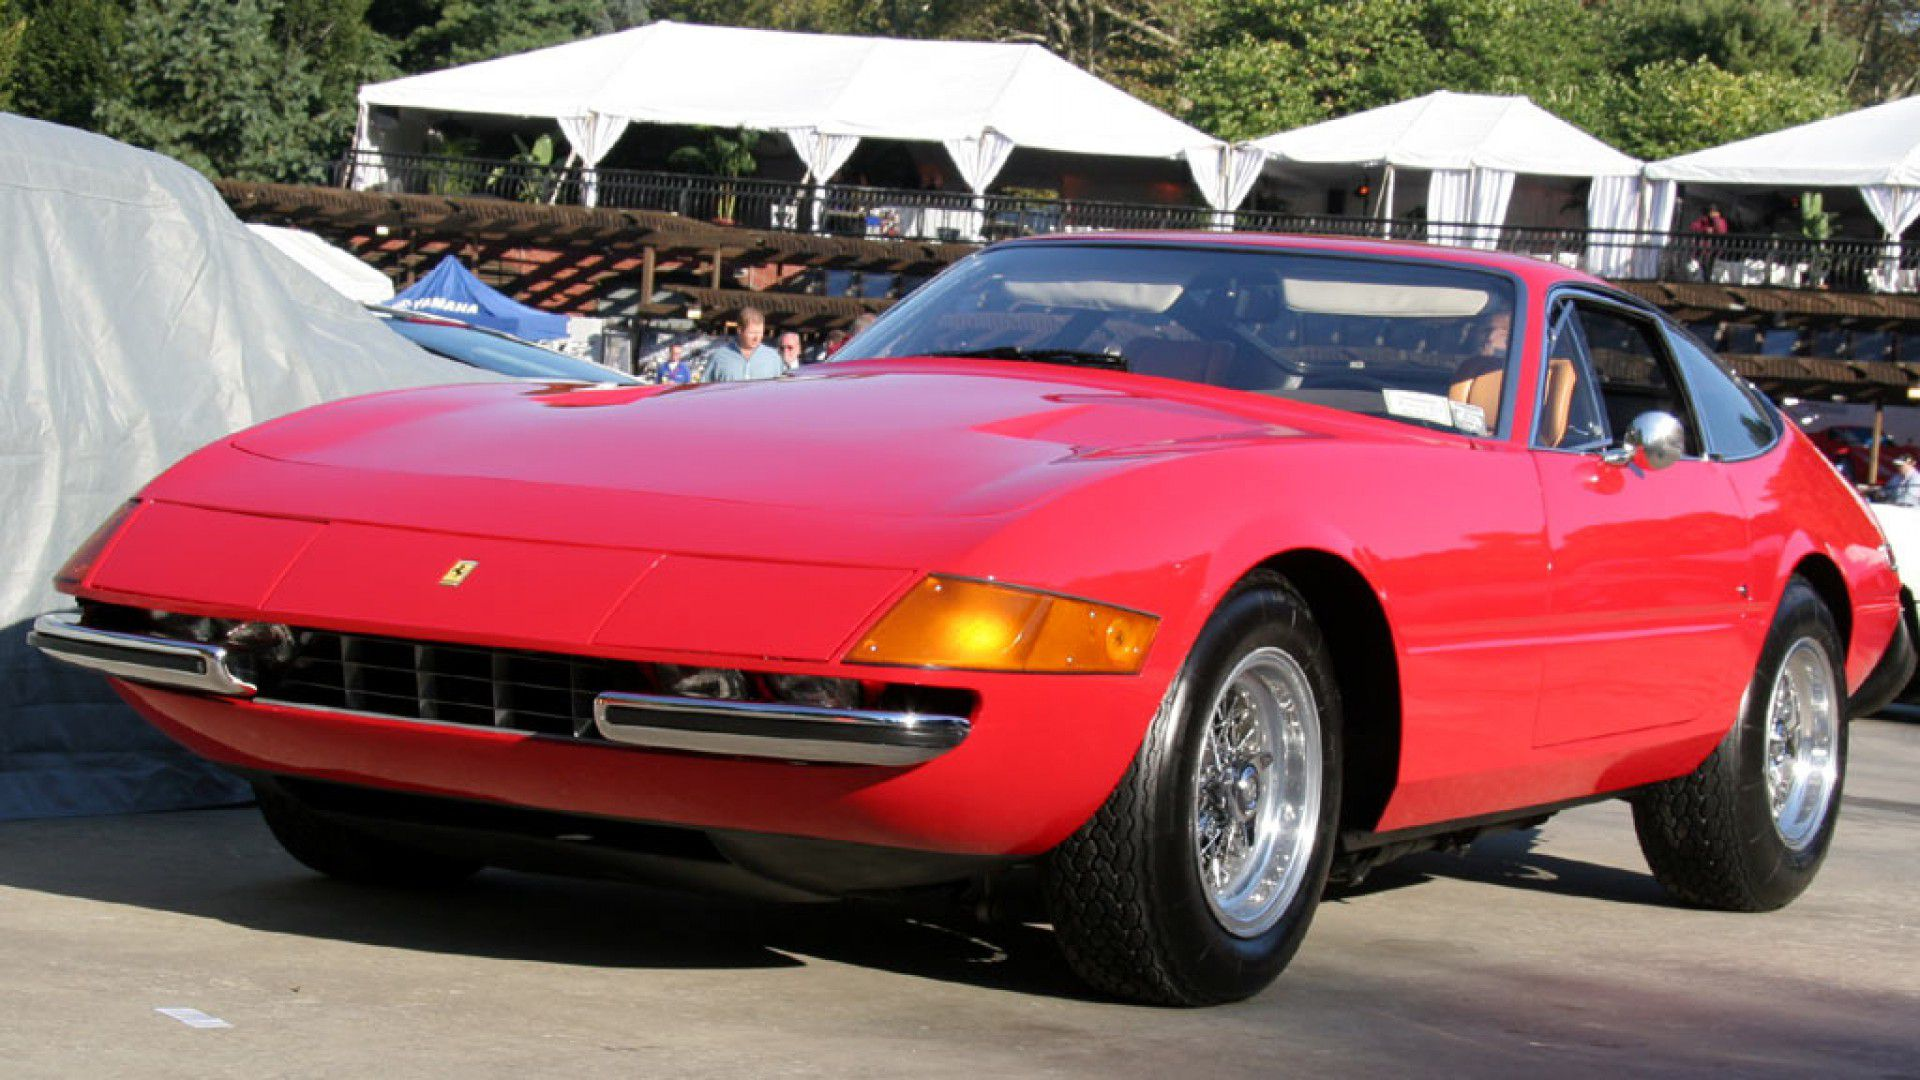 Ferrari 365 GTB/4 Coupe